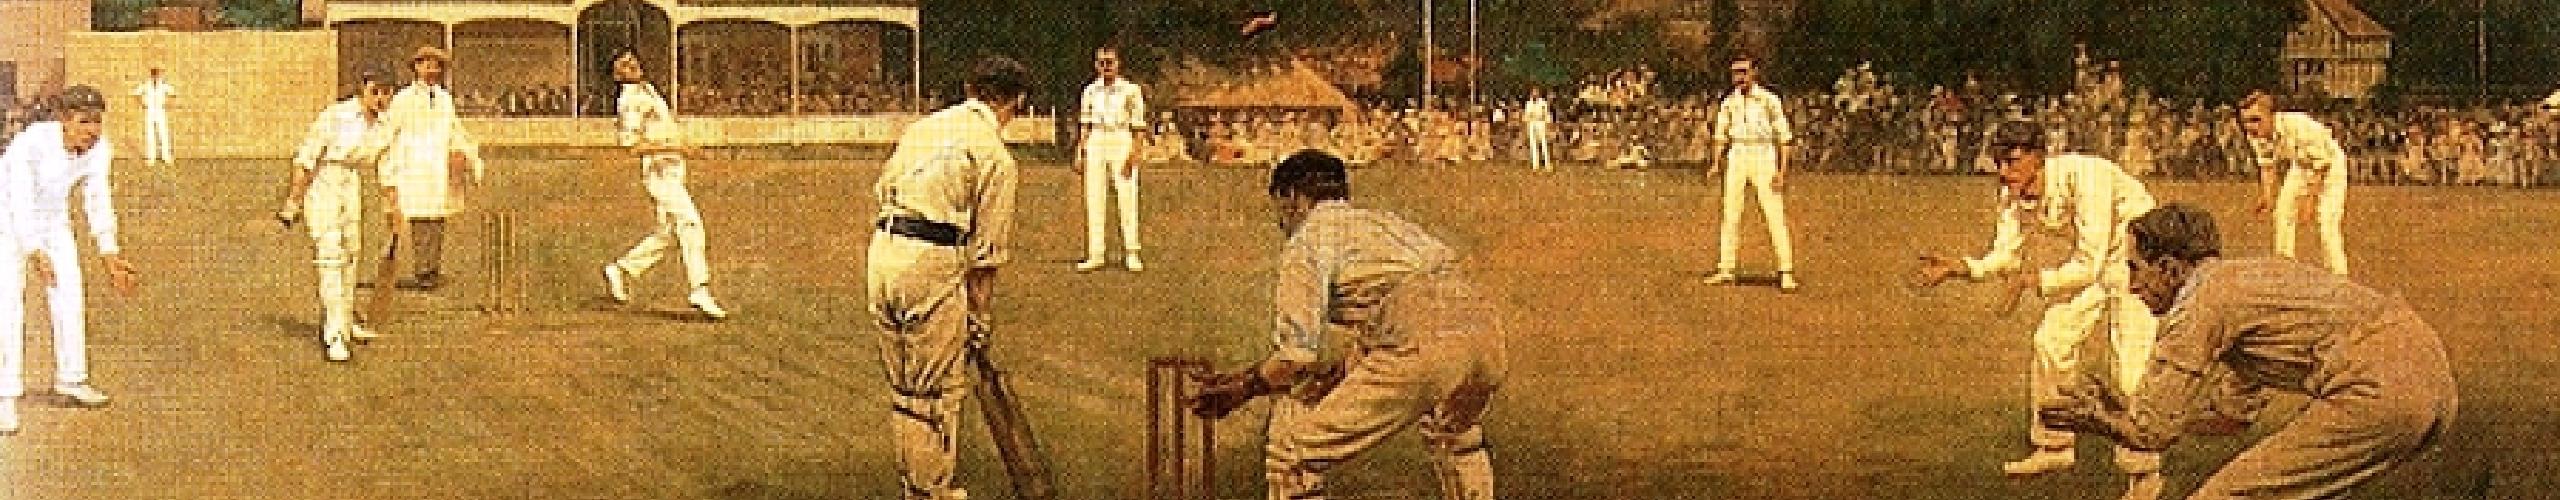 Cricket match panel background